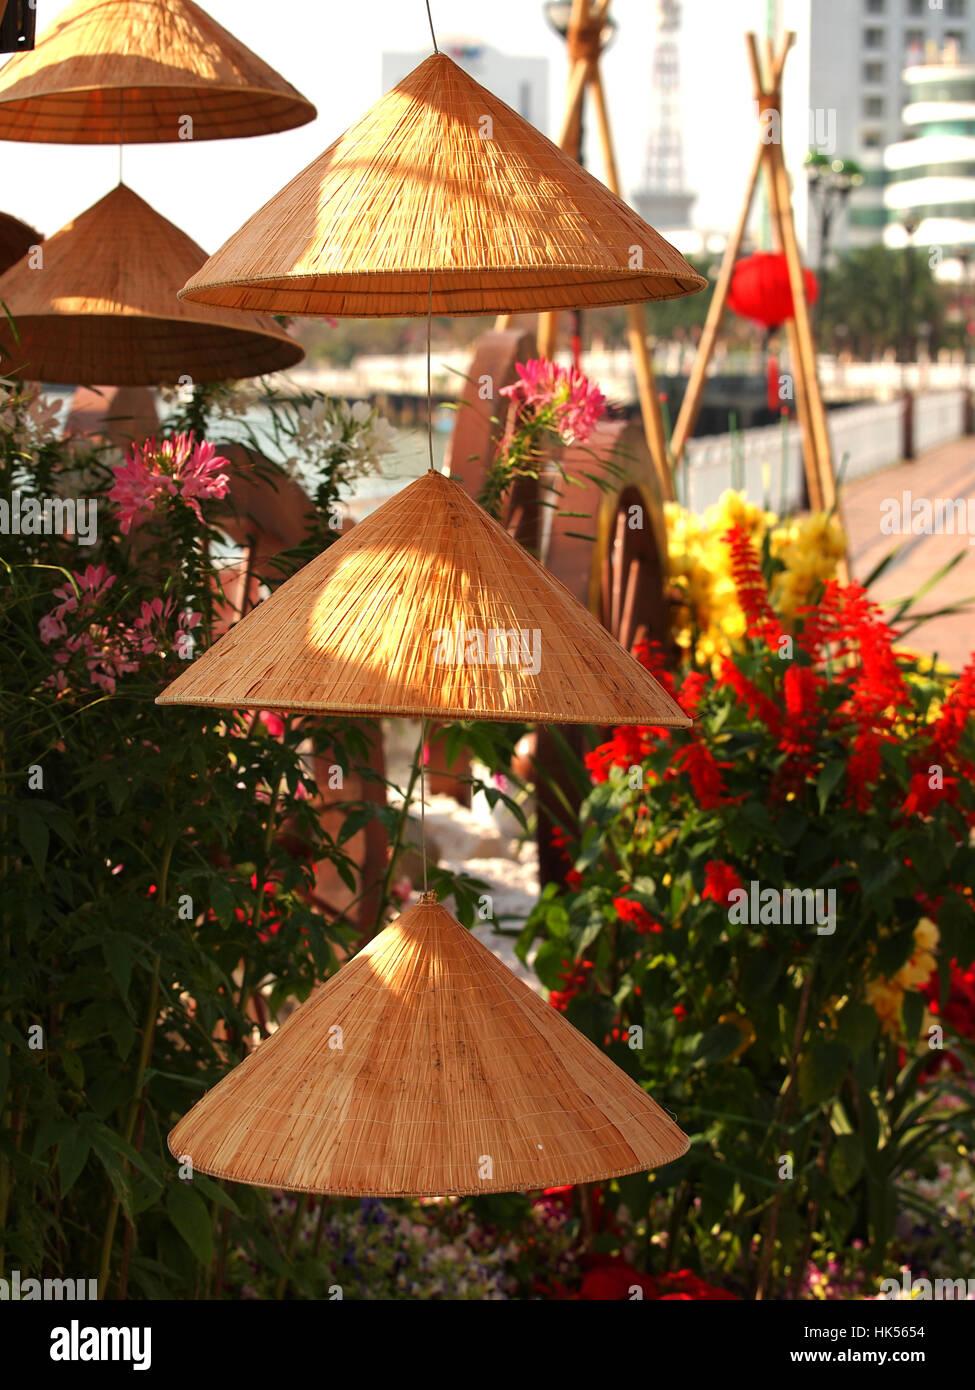 Vietnamese Tradicional Hat Stock Photos & Vietnamese Tradicional Hat ...